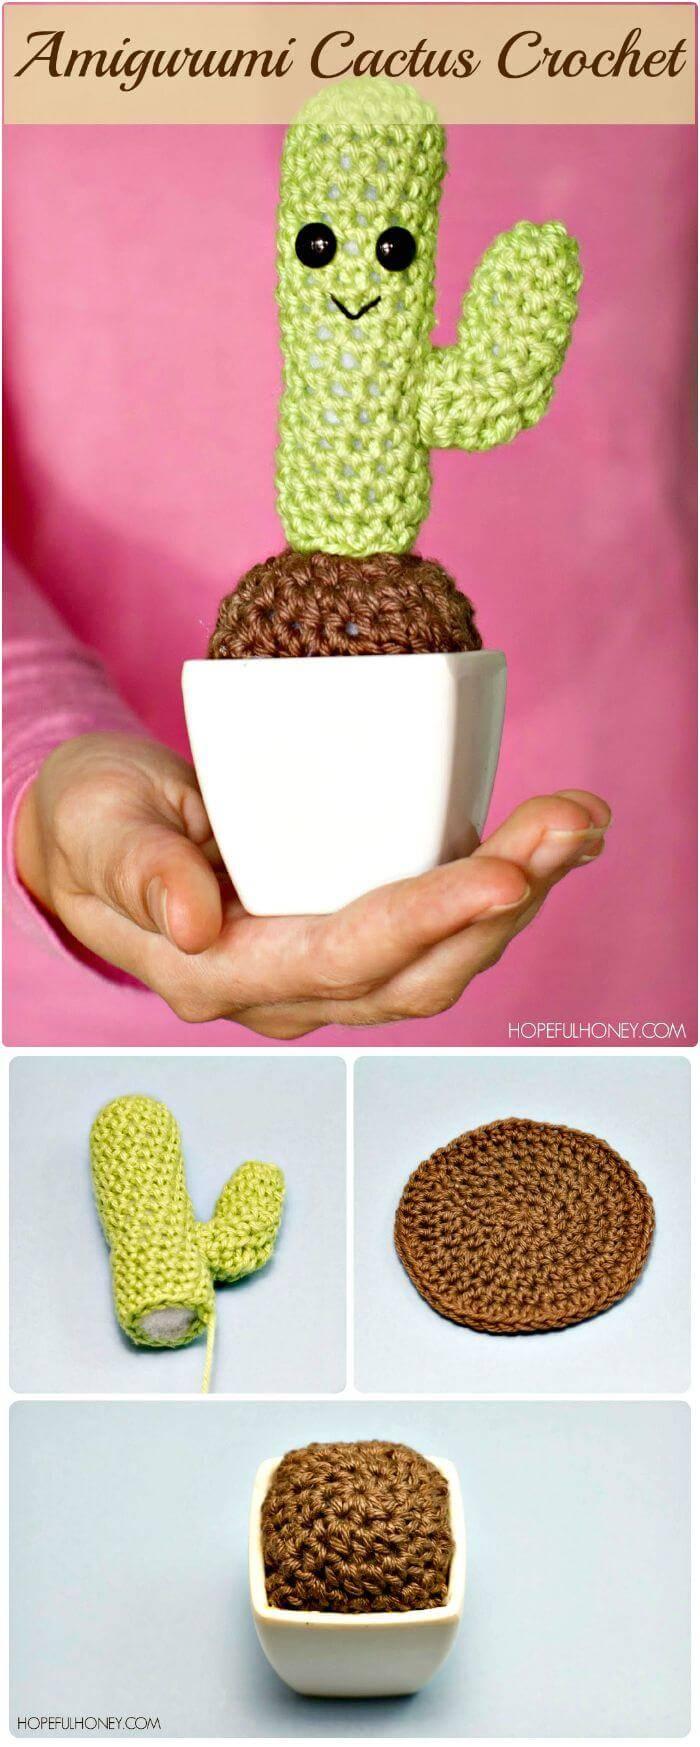 Amigurumi Cactus Crochet